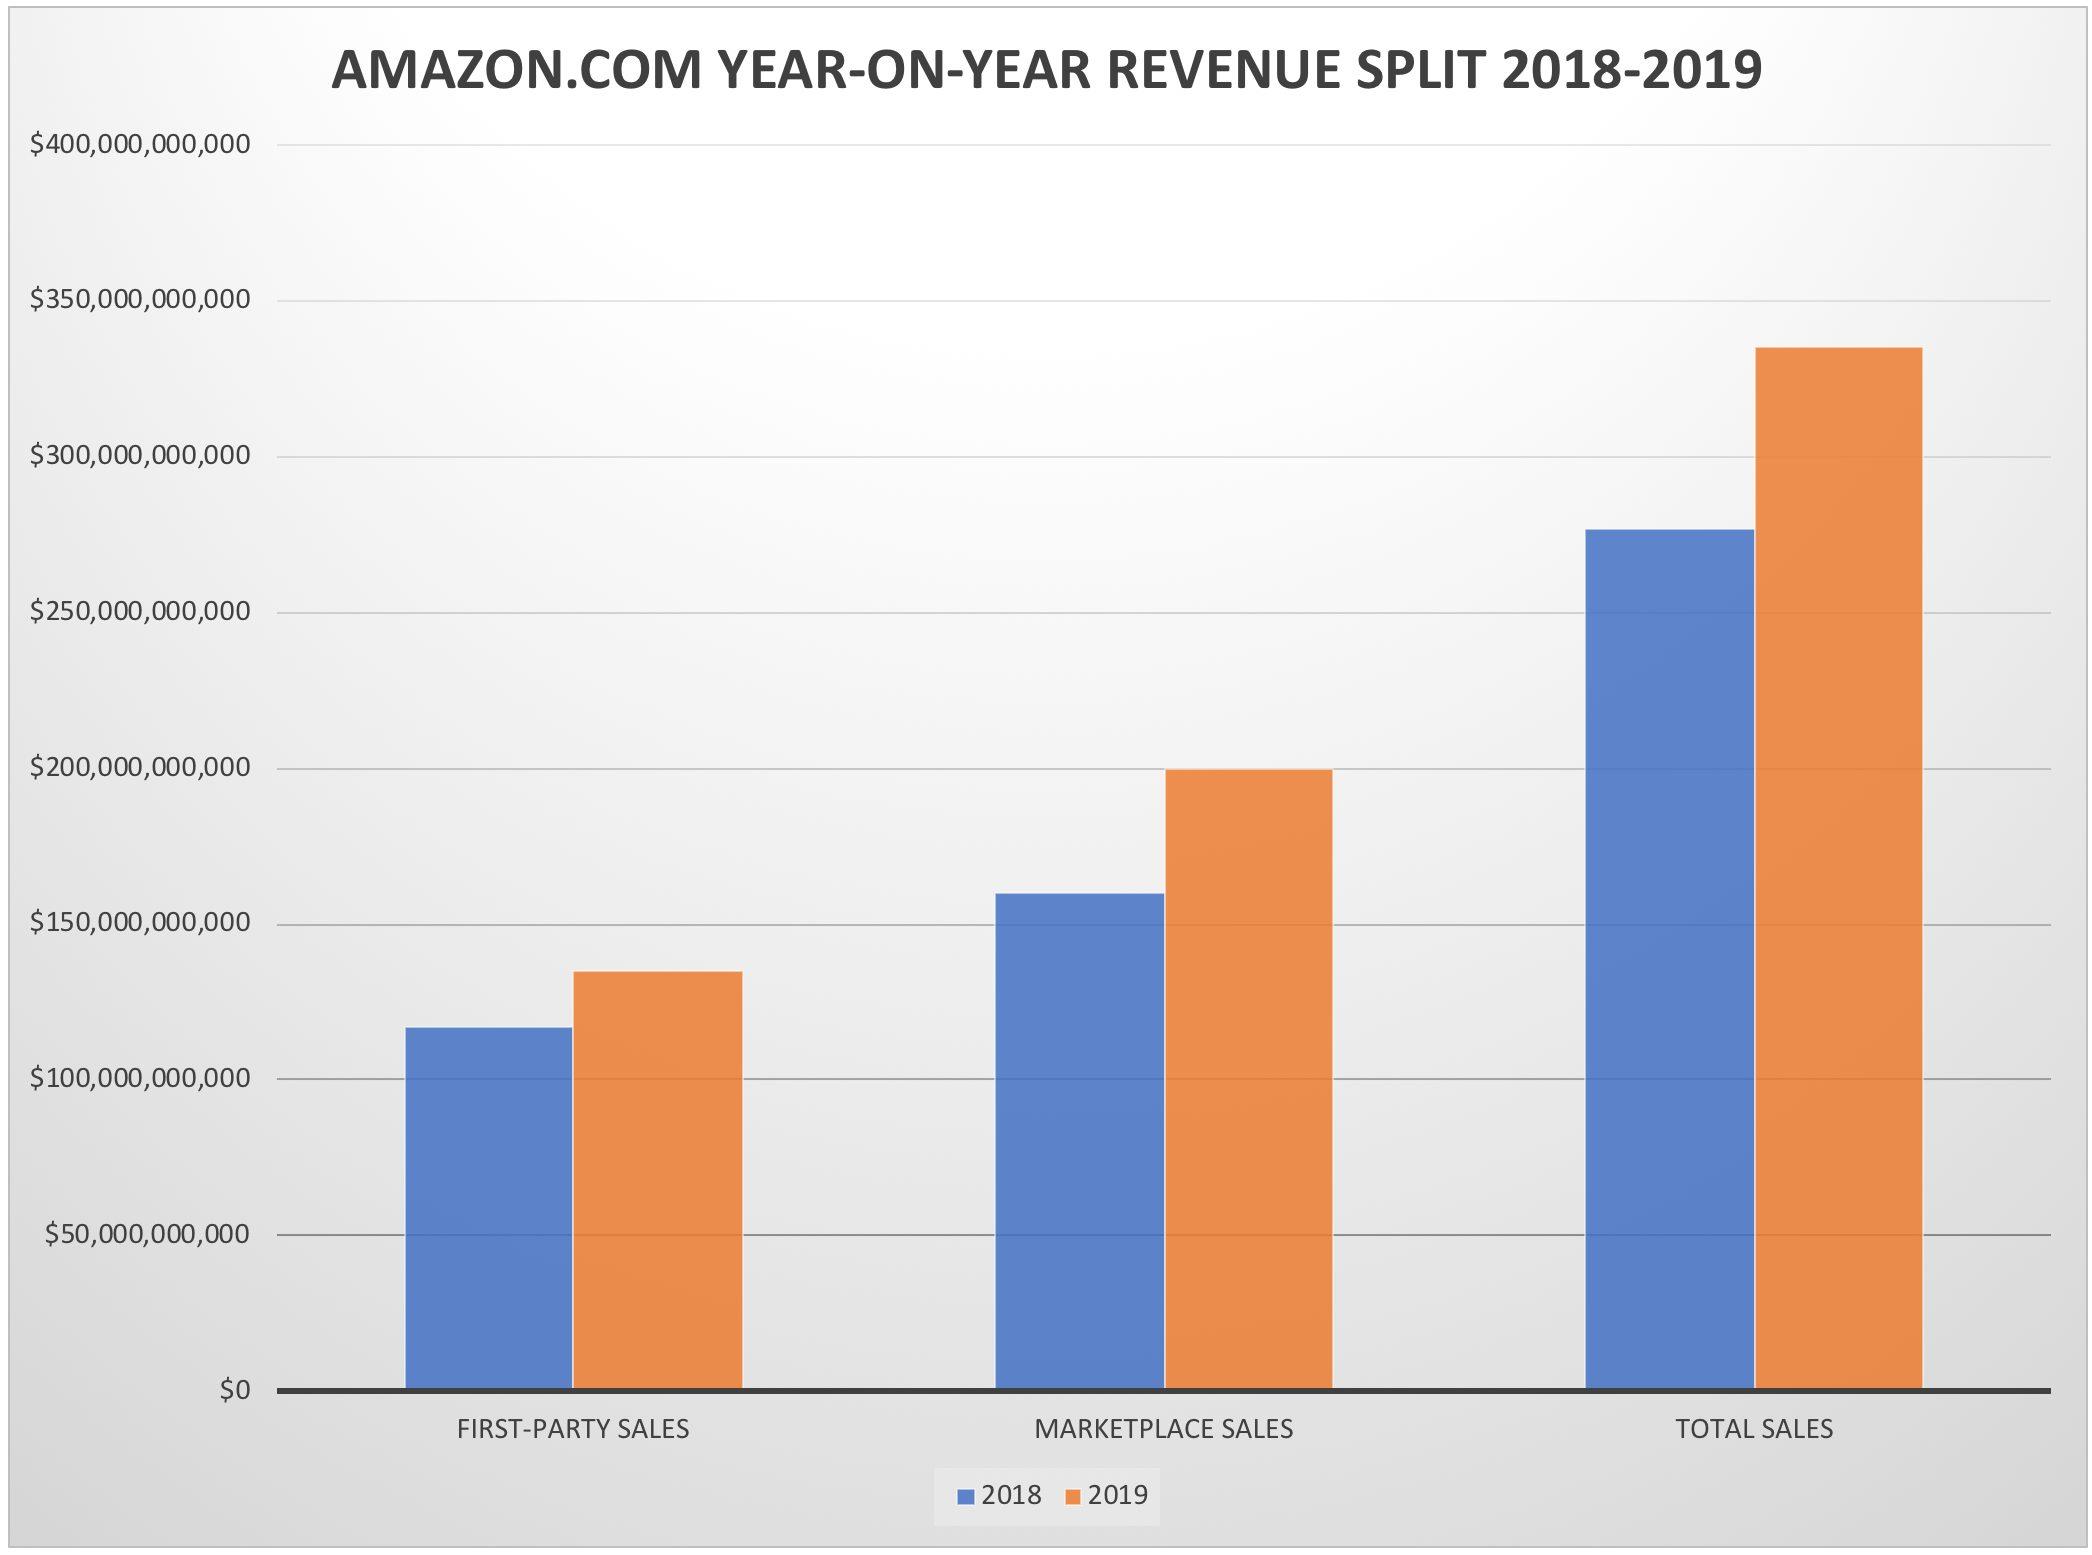 Amazon.com Year-on-Year Revenue Split 2018-2019